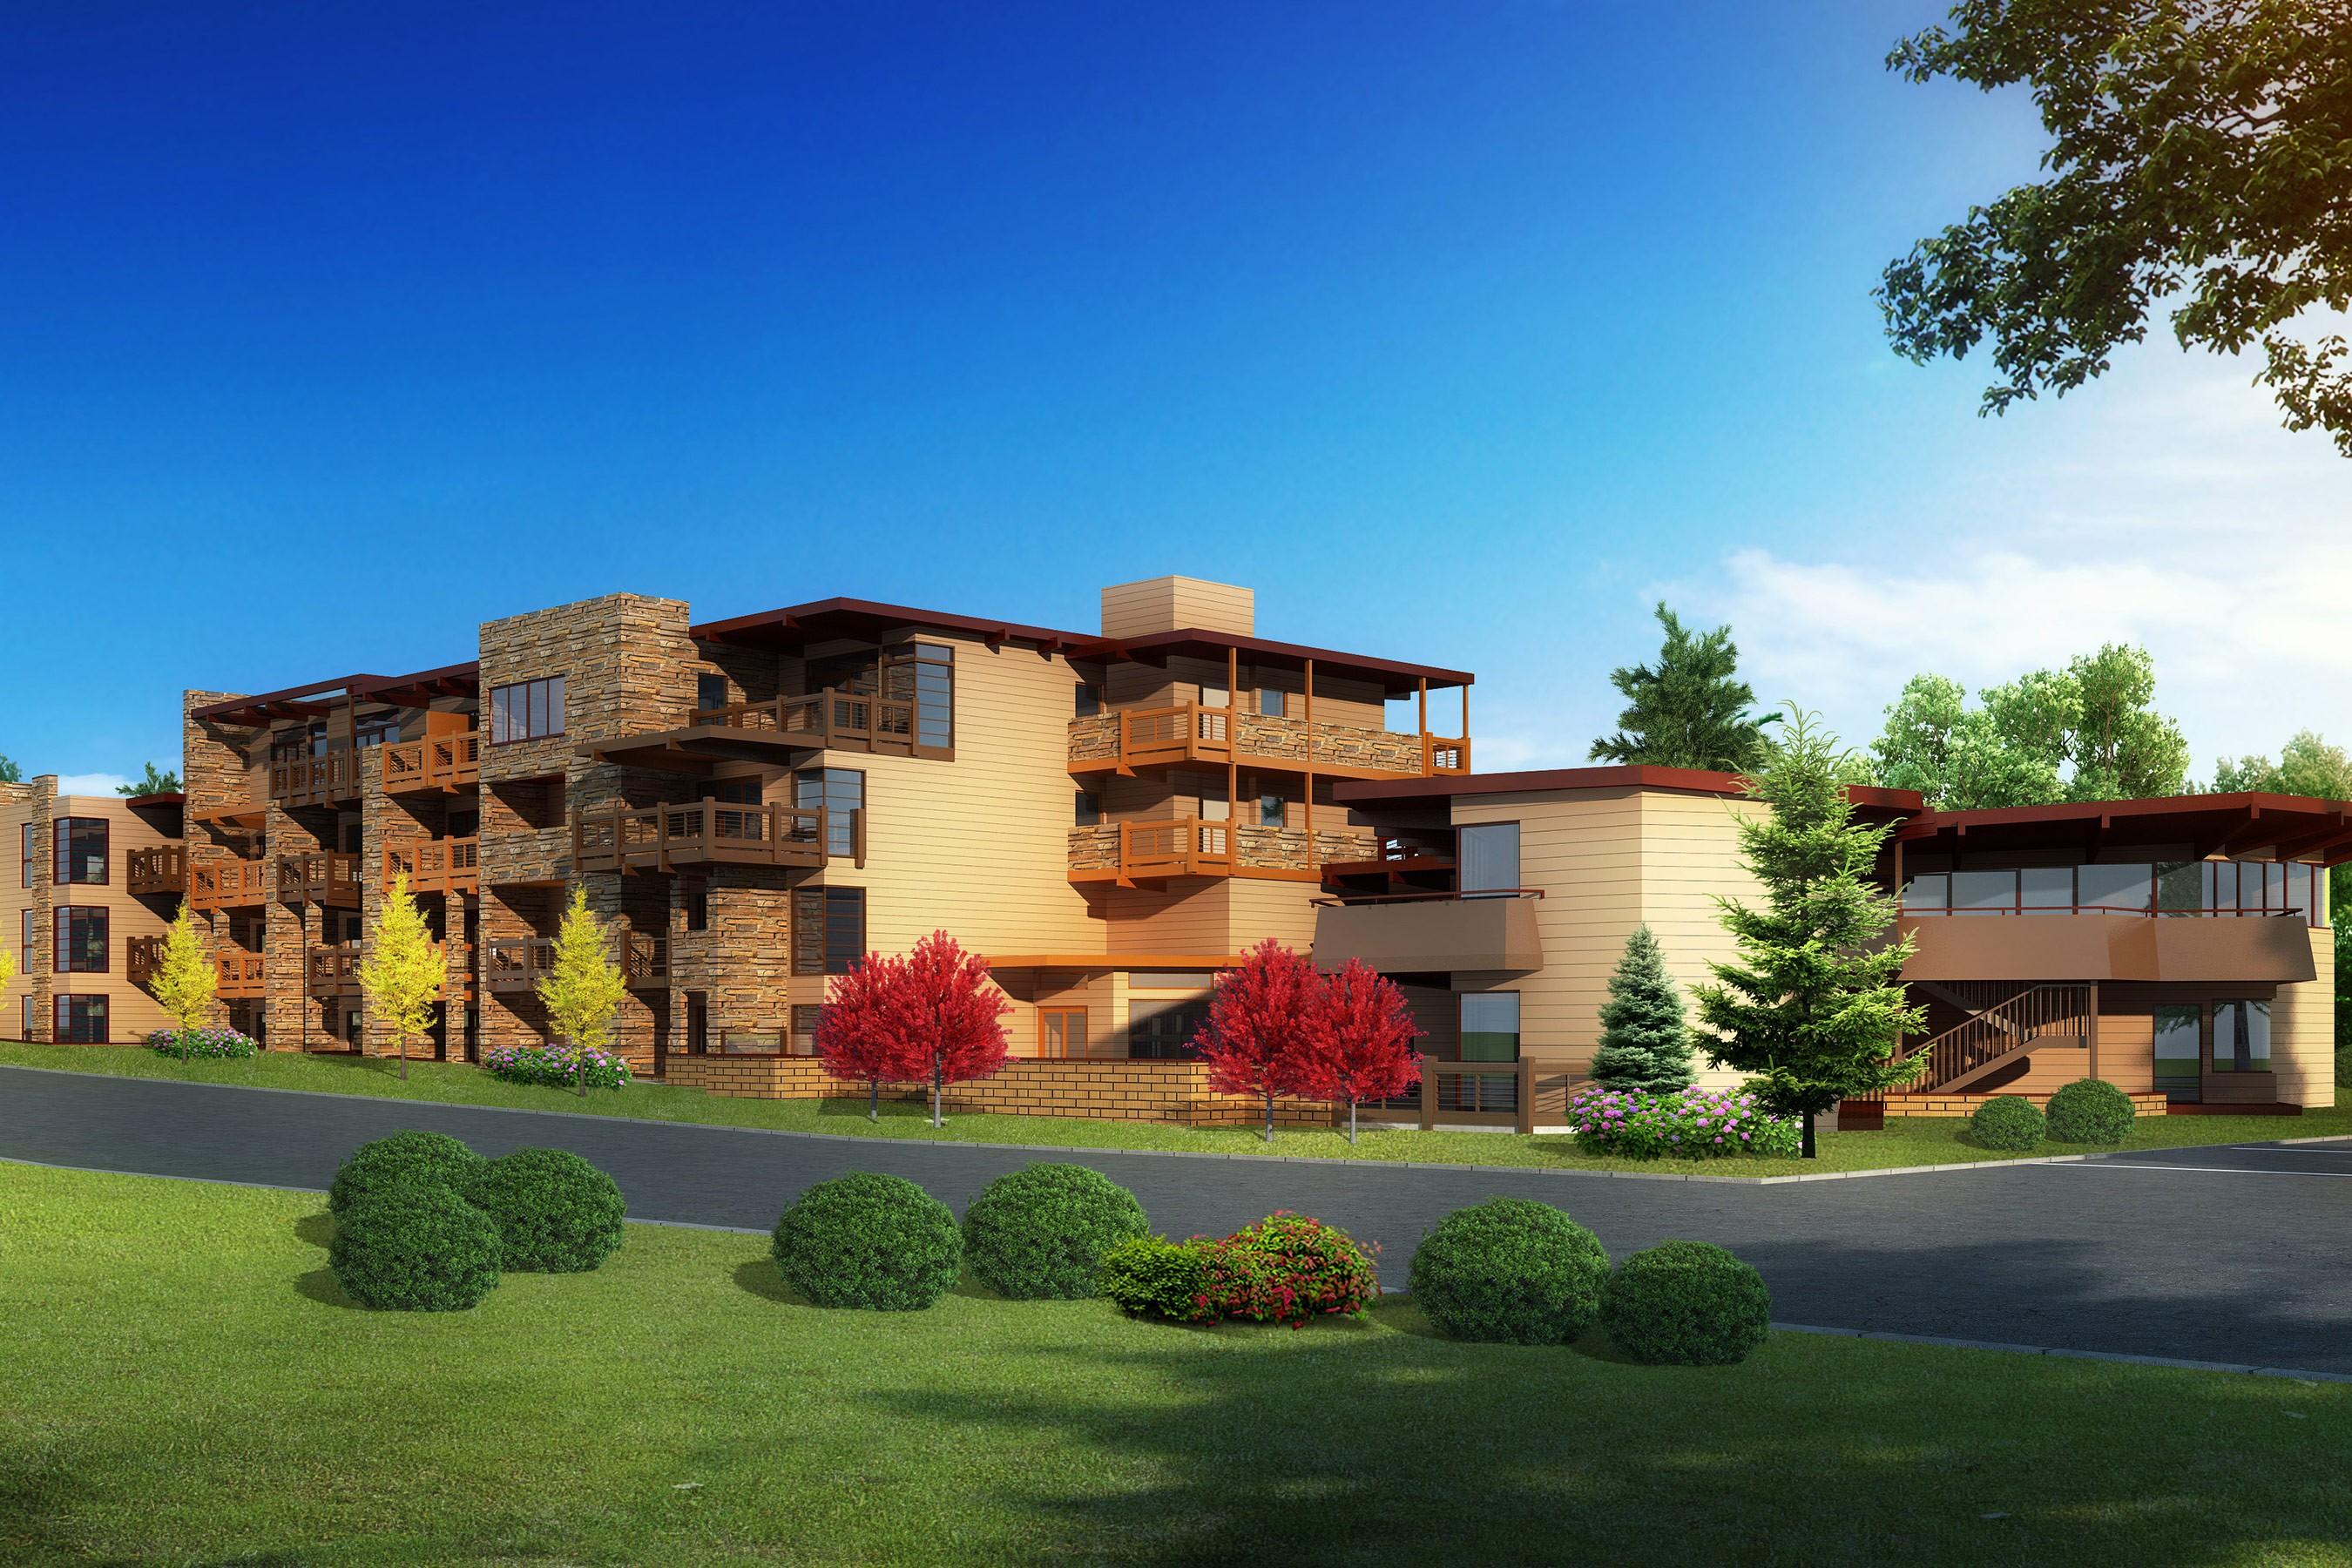 Condominium for Sale at Boomerang Lodge 500 W. Hopkins Avenue Unit 402 Aspen, Colorado, 81611 United States